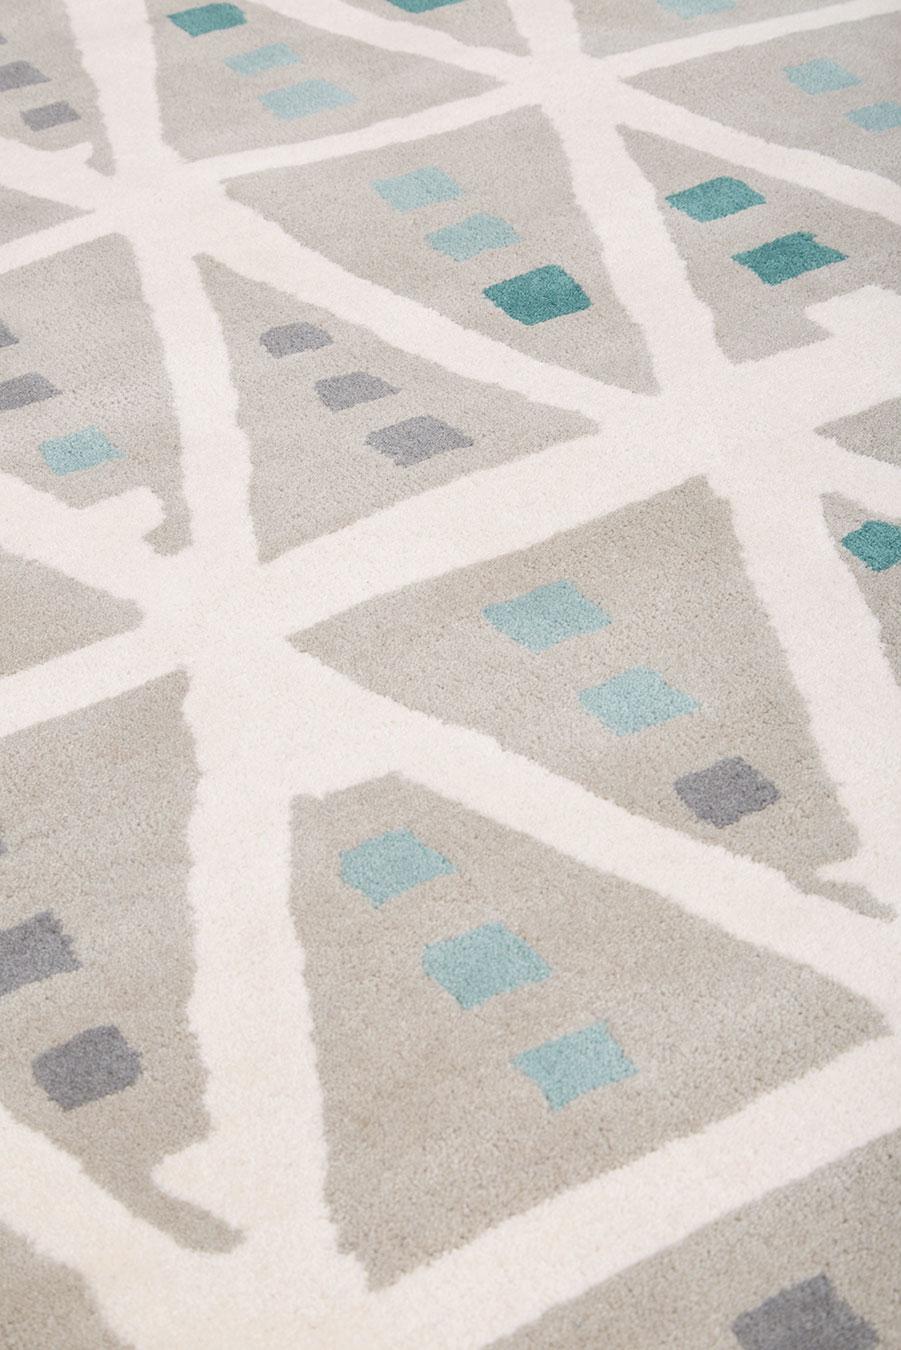 Detailed image of geometric Teepee rug